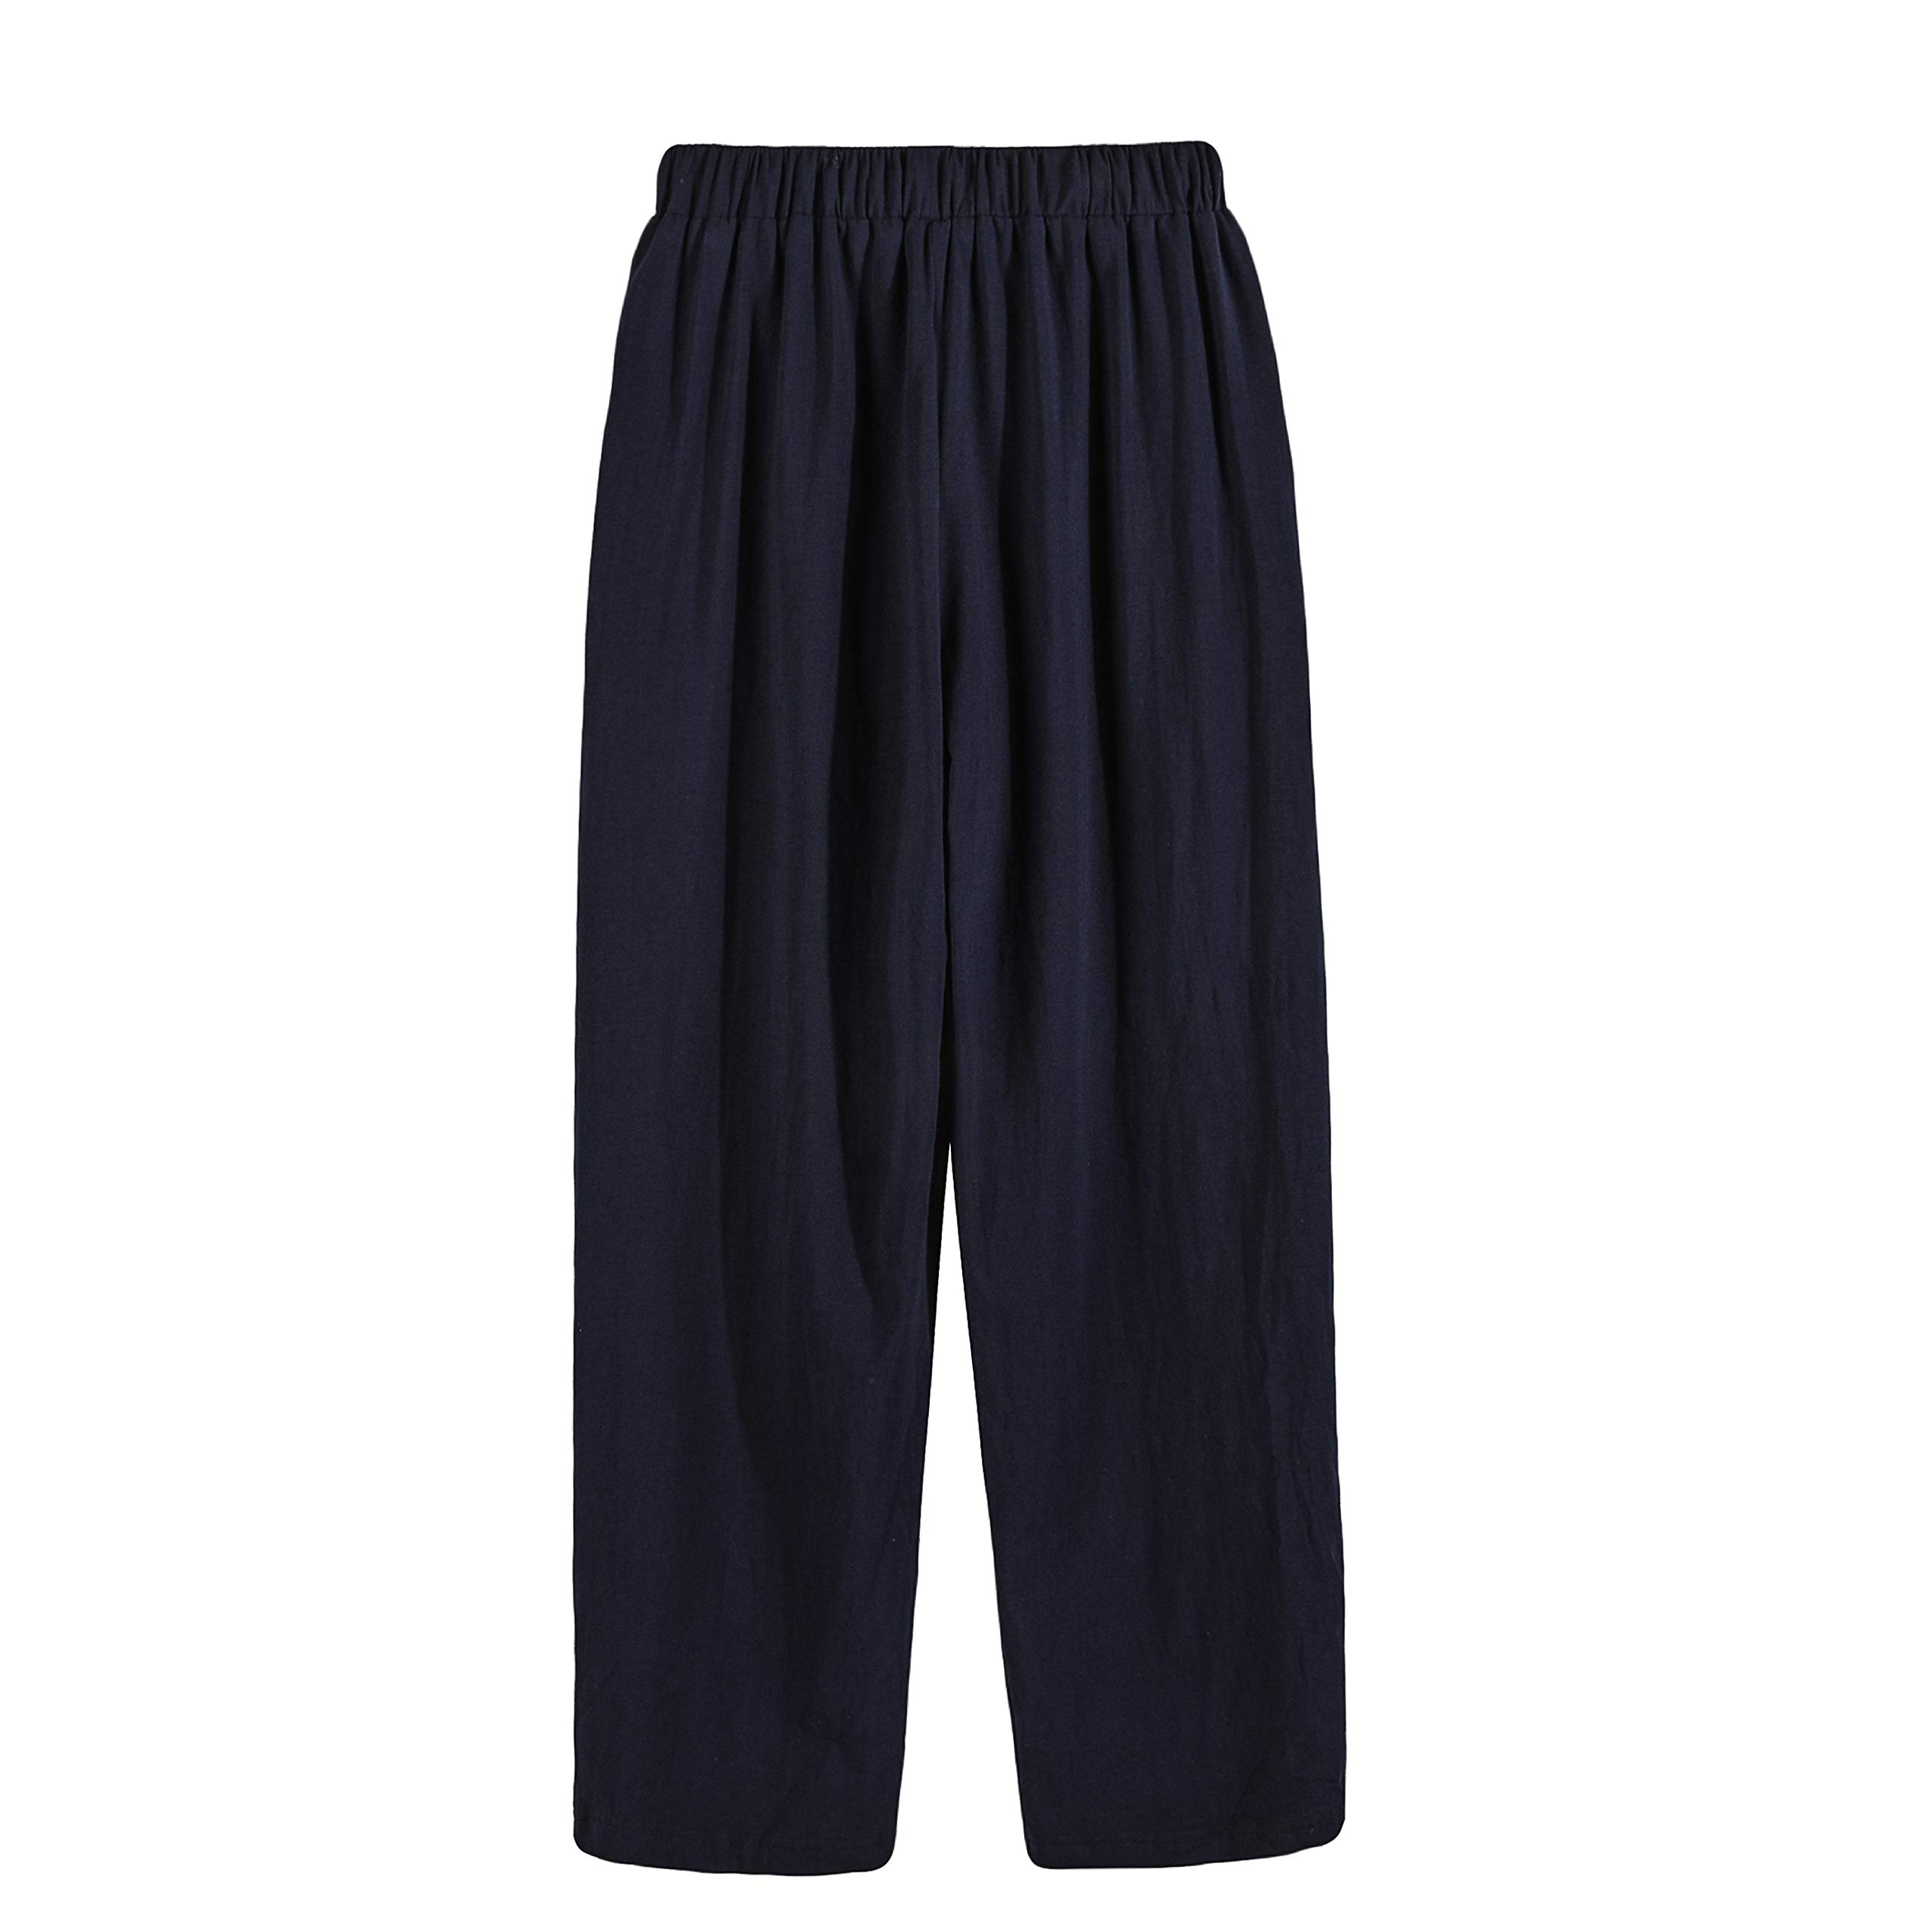 Suntasty Herren Schlafanzughose Pyjamahose Hose Lang(SP1001M/blueS)